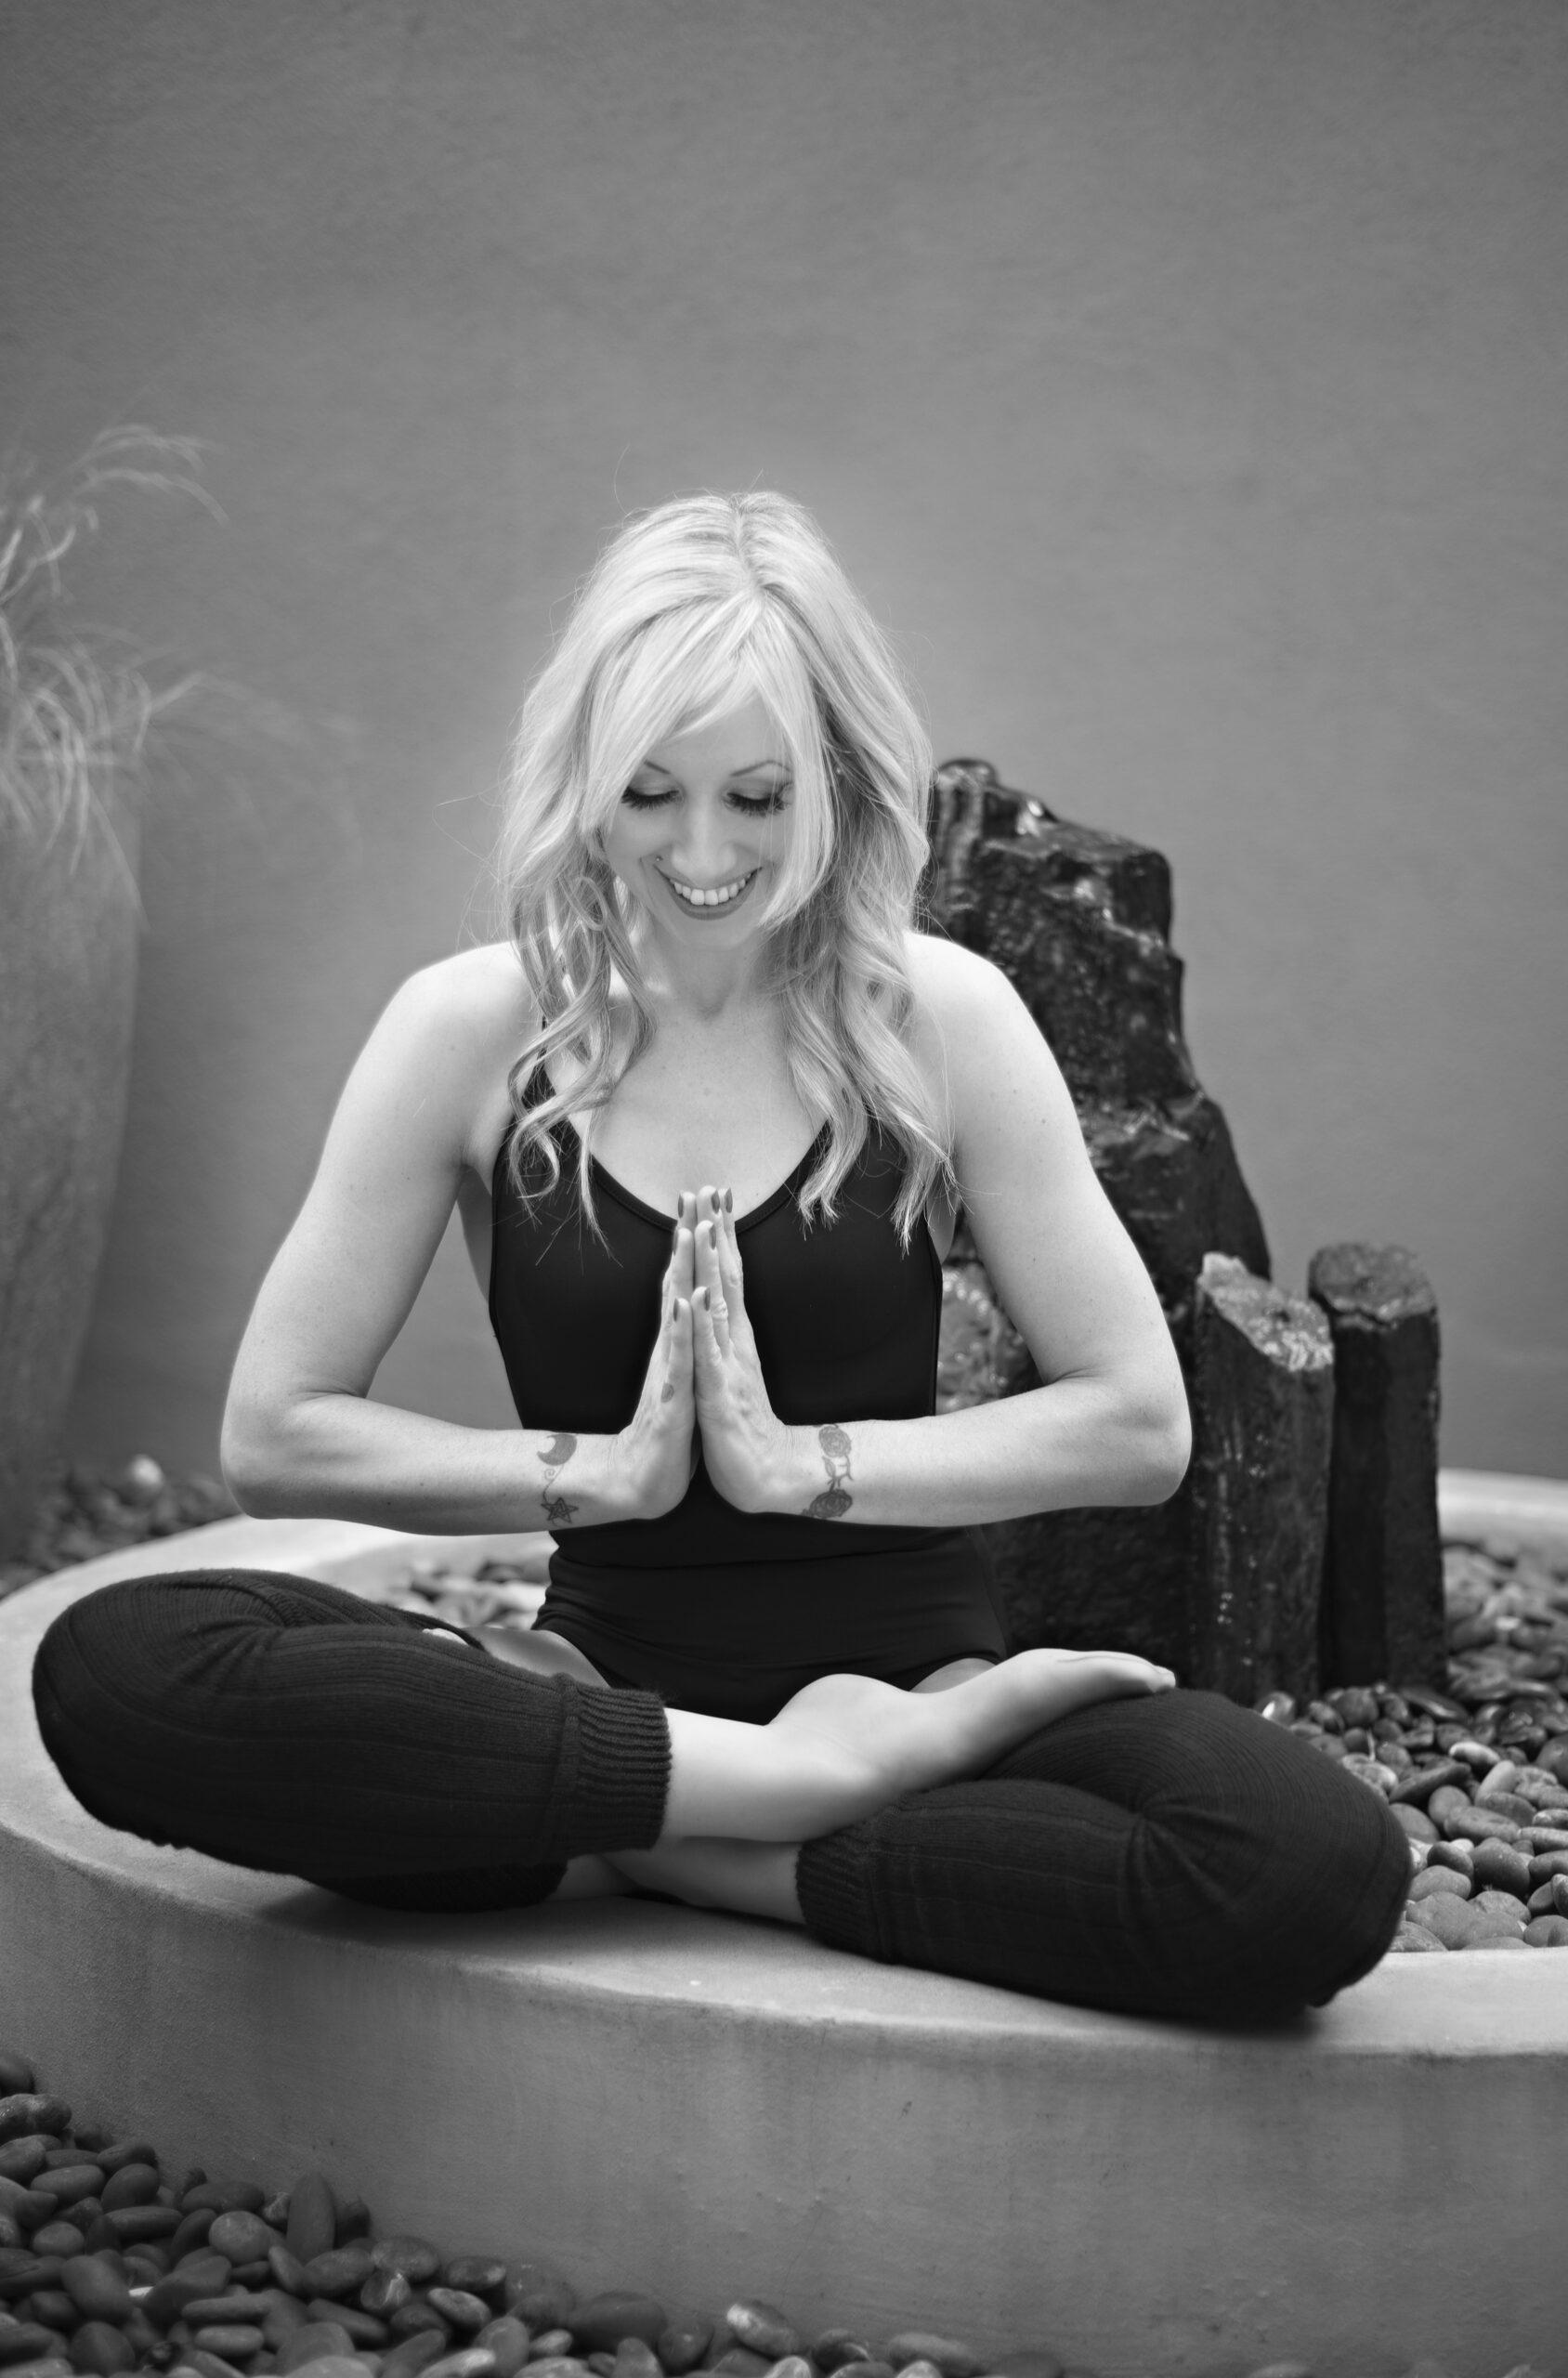 sofia skydance massage yoga